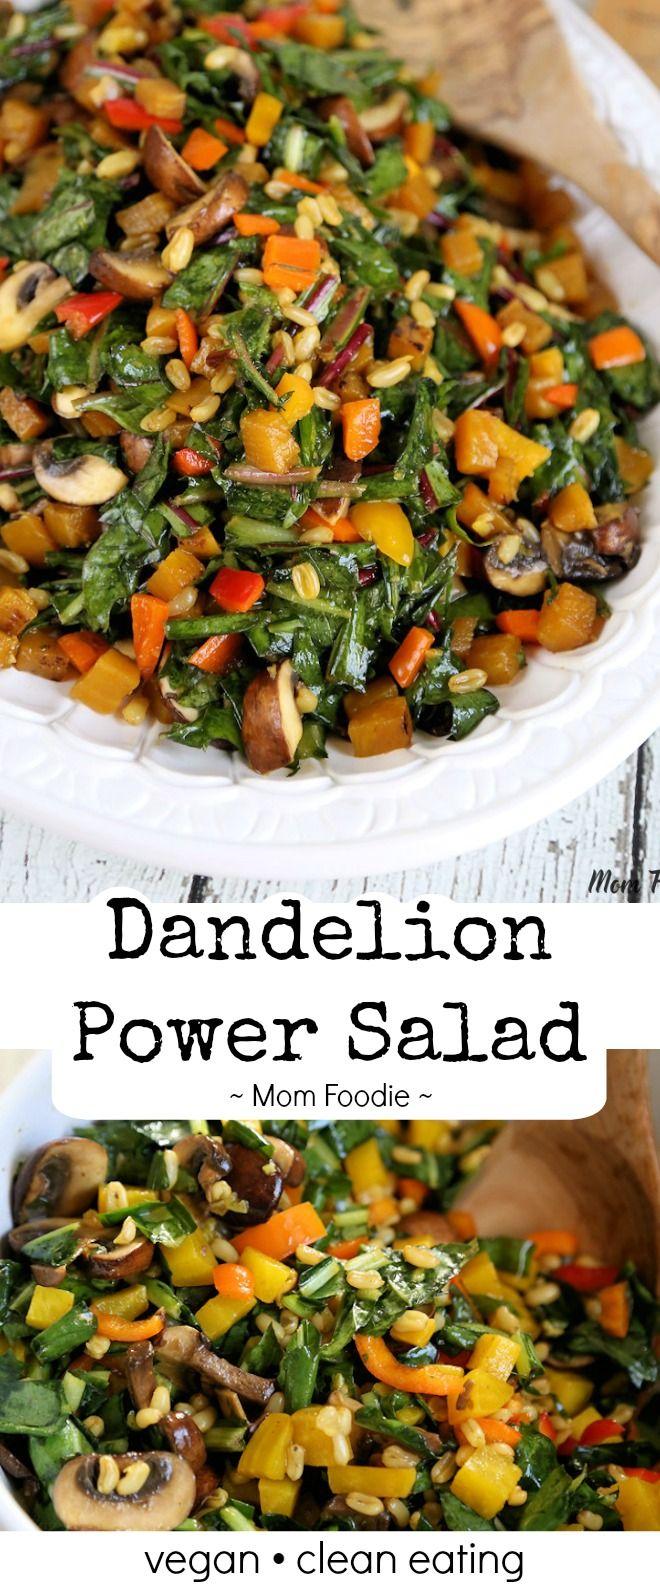 Dandelion Greens Salad Recipe With Golden Beets Kamut Mushrooms Sweet Peppers Easy Dandelion S Dandelion Greens Recipes Dandelion Recipes Dandelion Salad